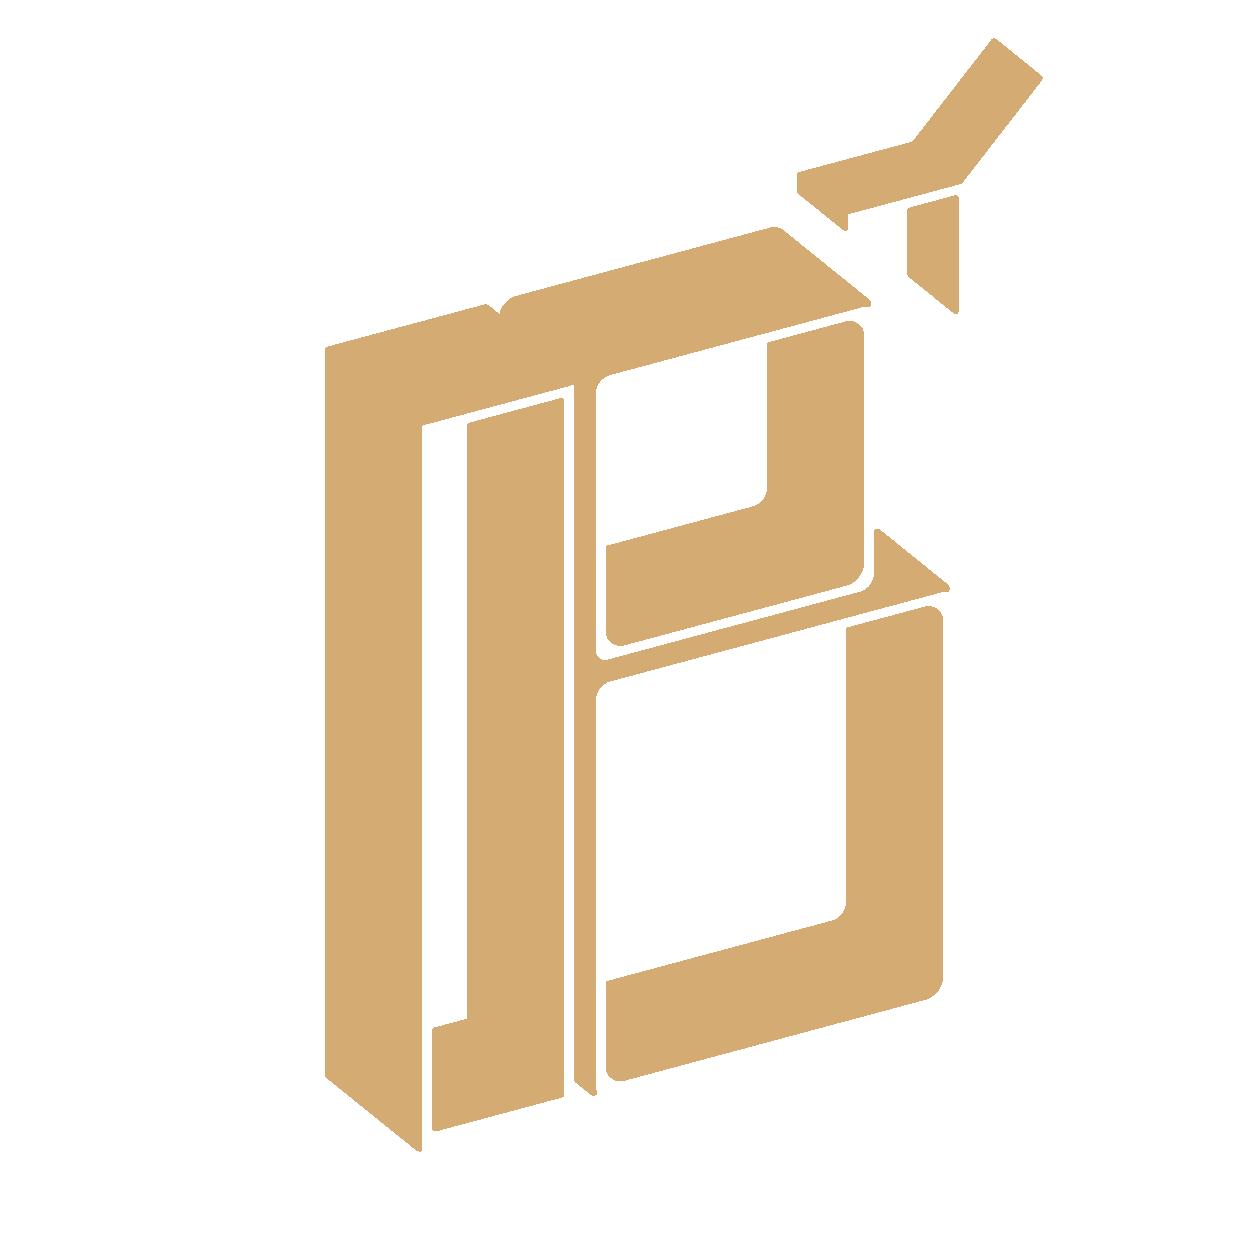 Bangkok Dec-Con Public Company Limited